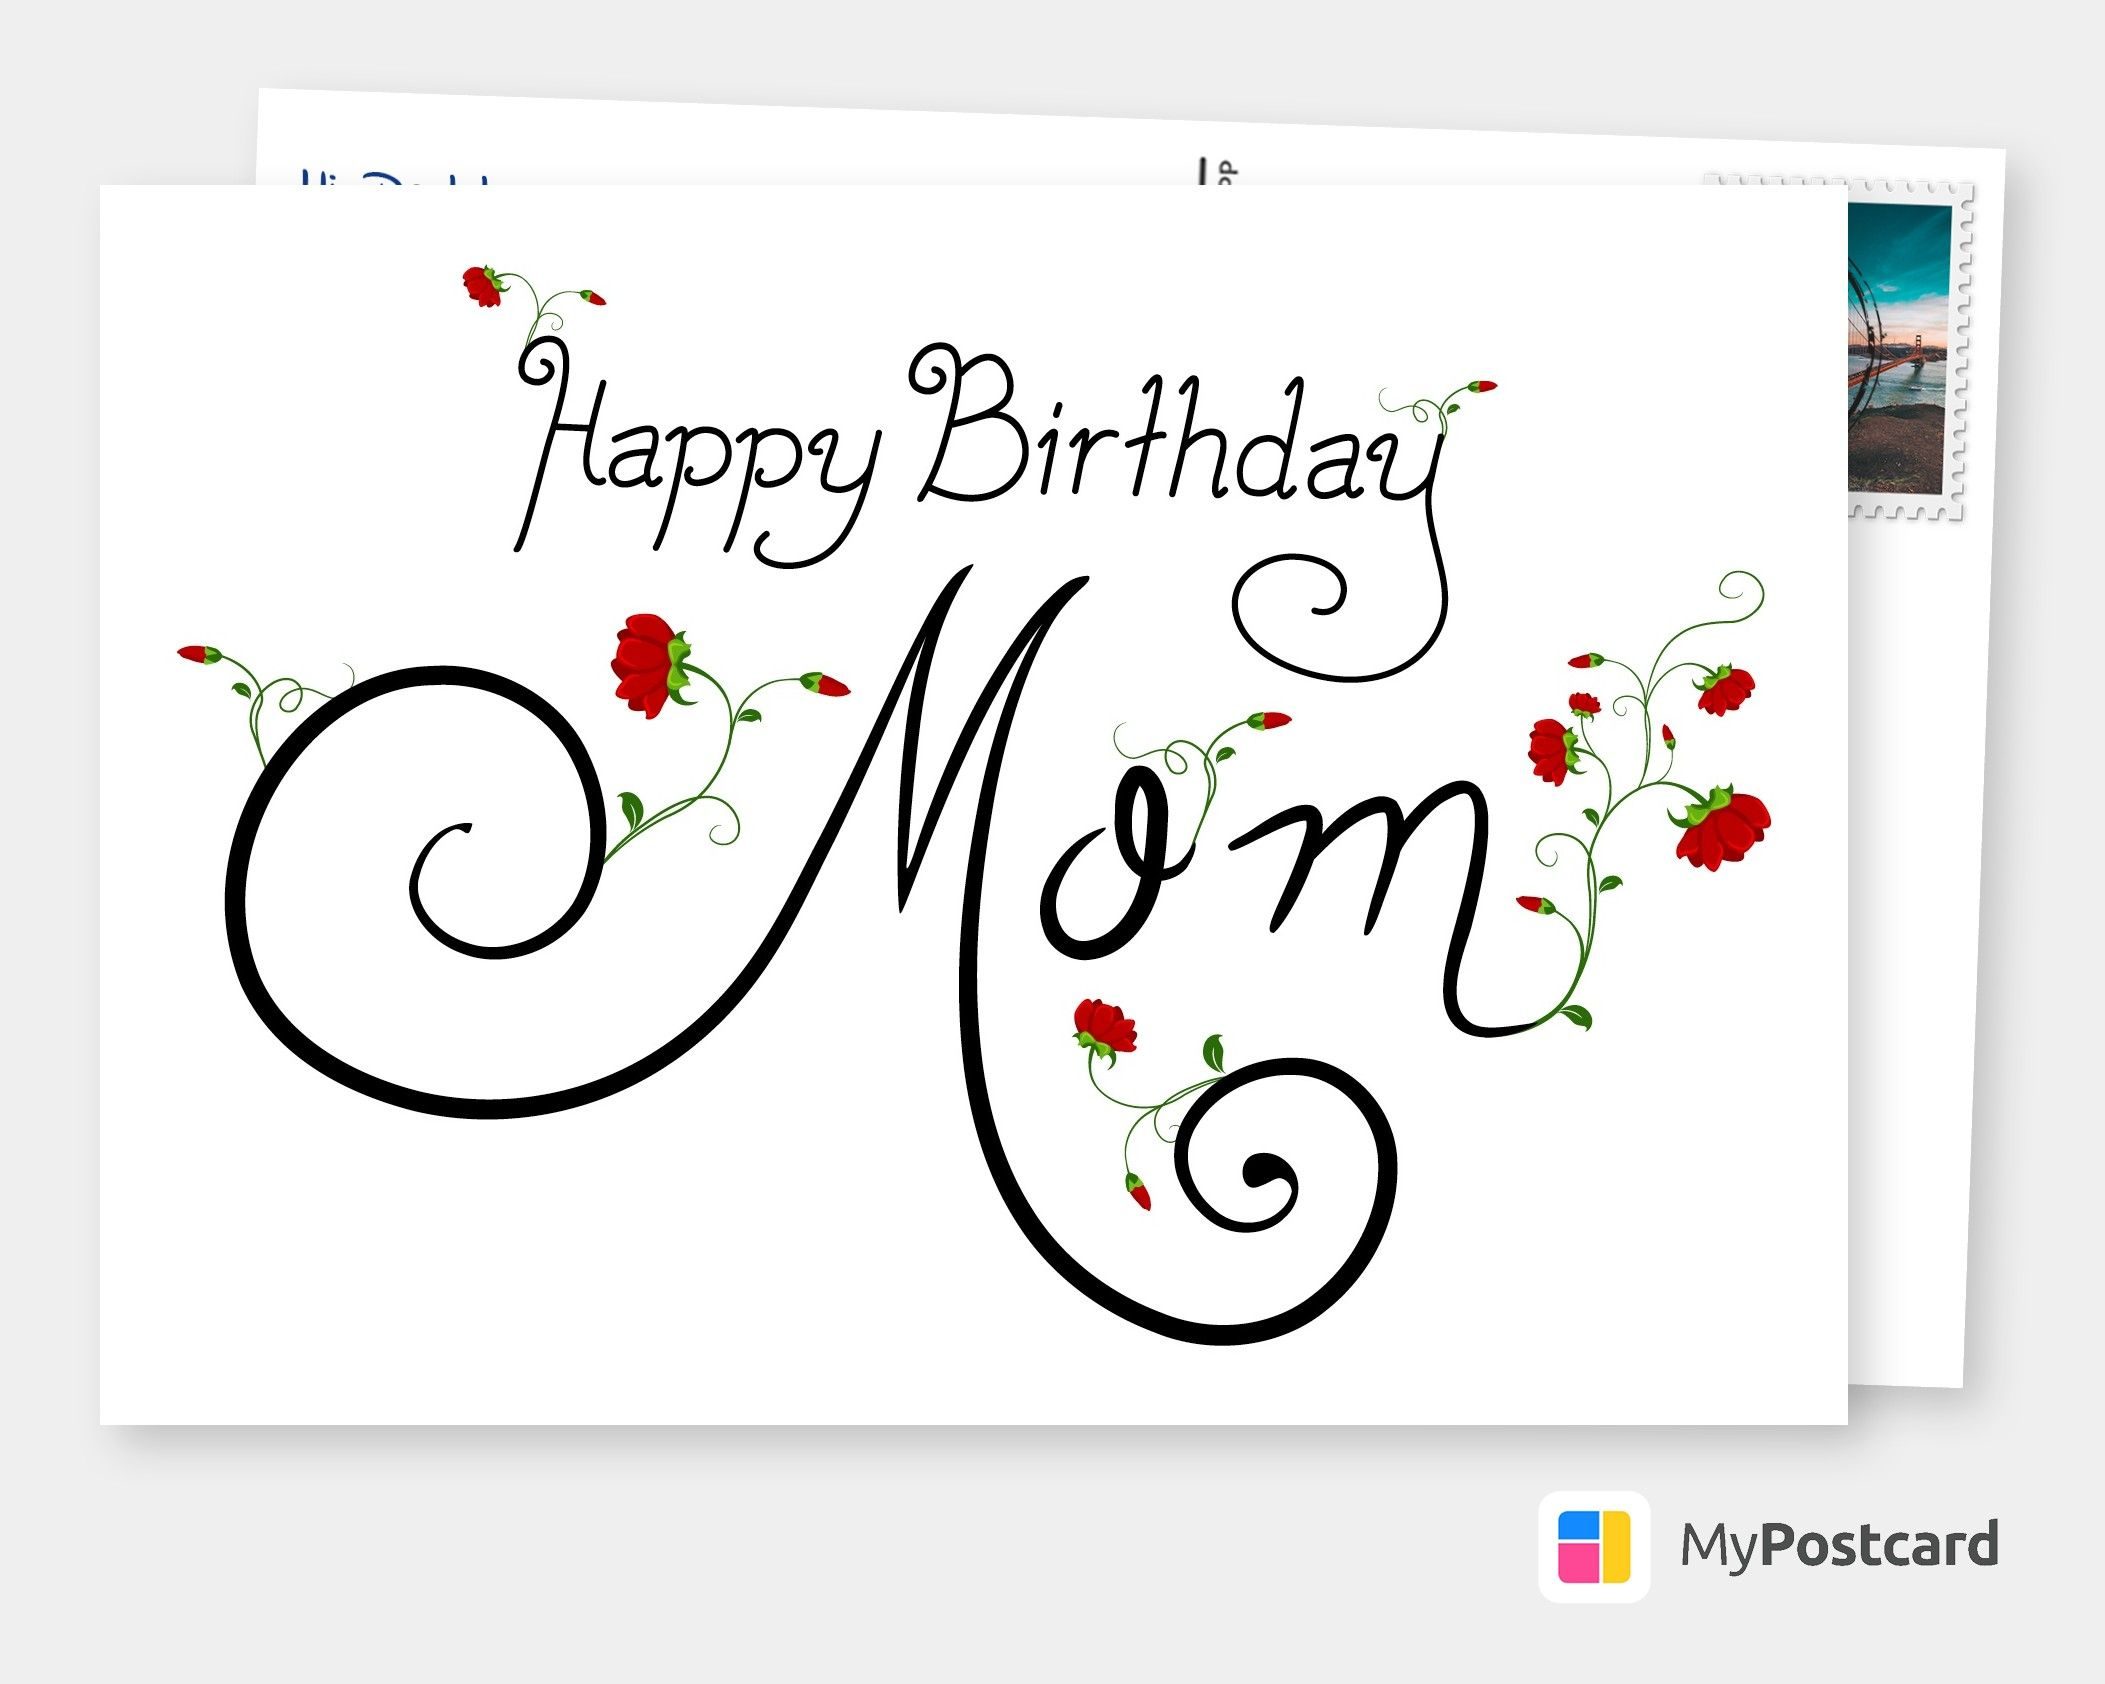 Send Happy Birthday Cards Online